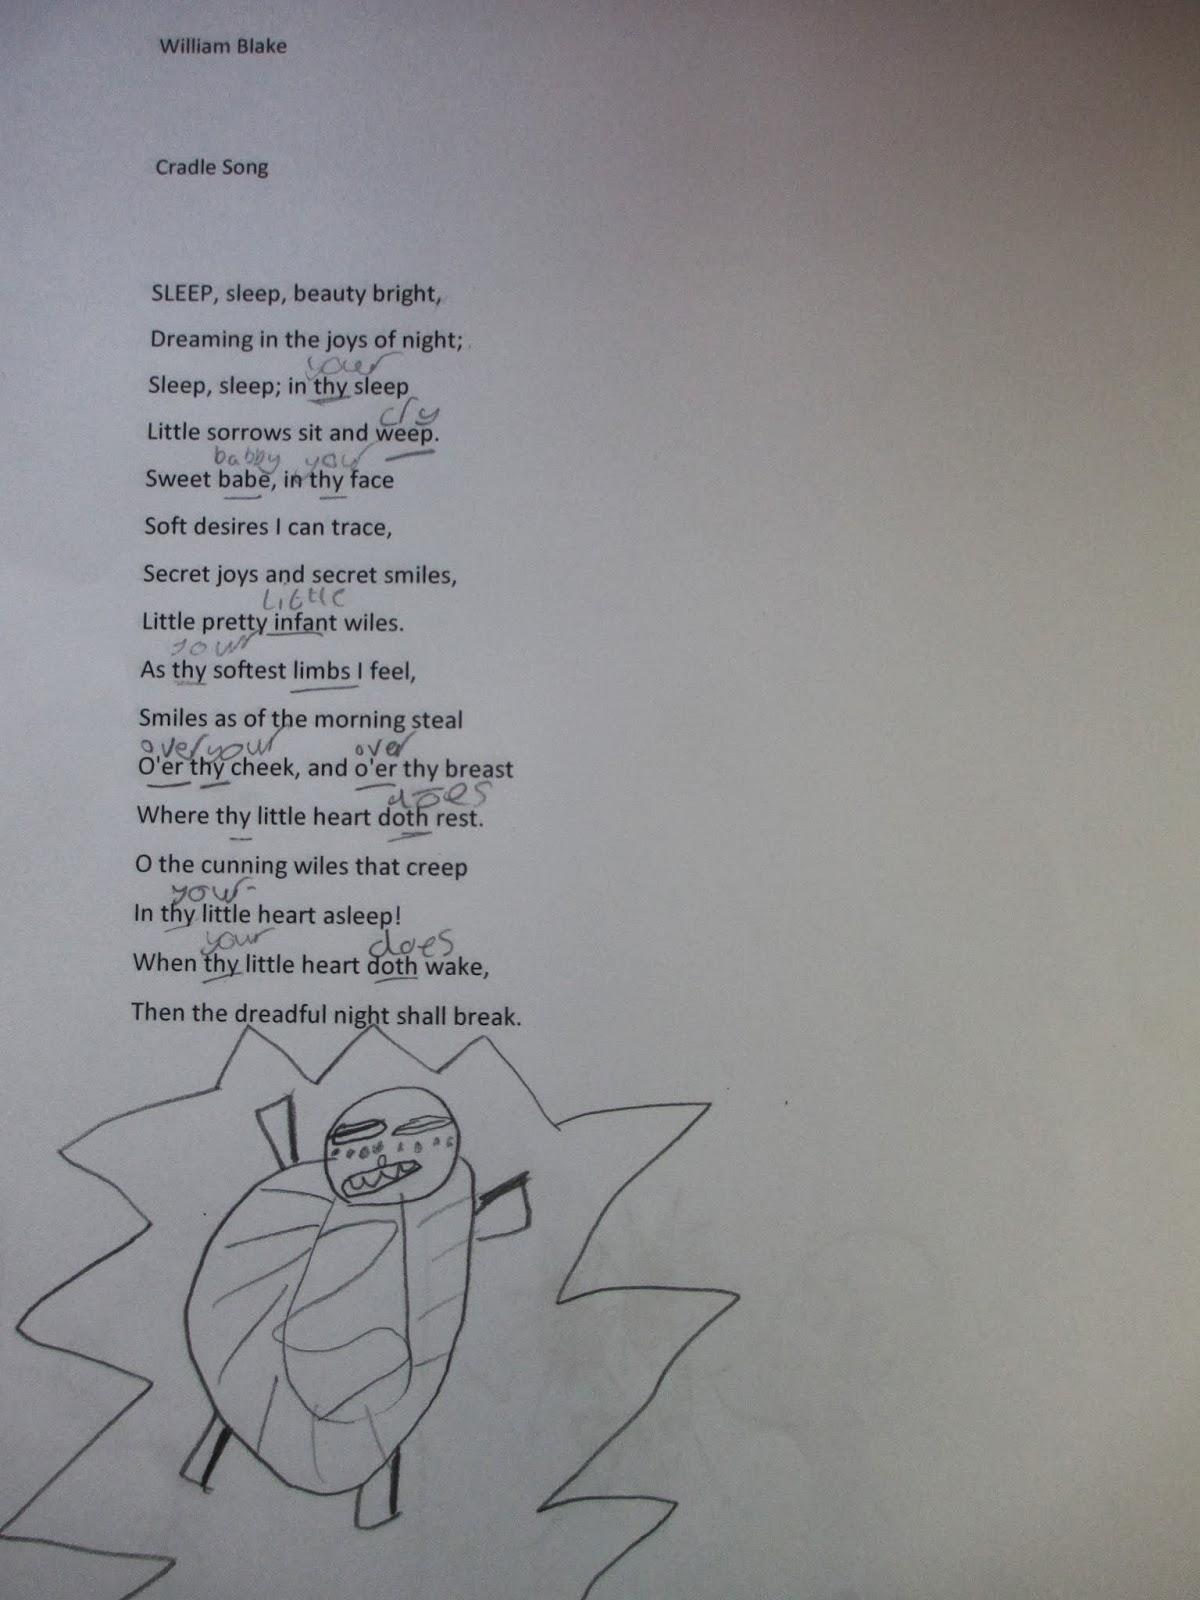 blake poems Blake: poems (everyman's library pocket poets series) [william blake, peter washington] on amazoncom free shipping on qualifying offers these everyman's library pocket poets hardcover.